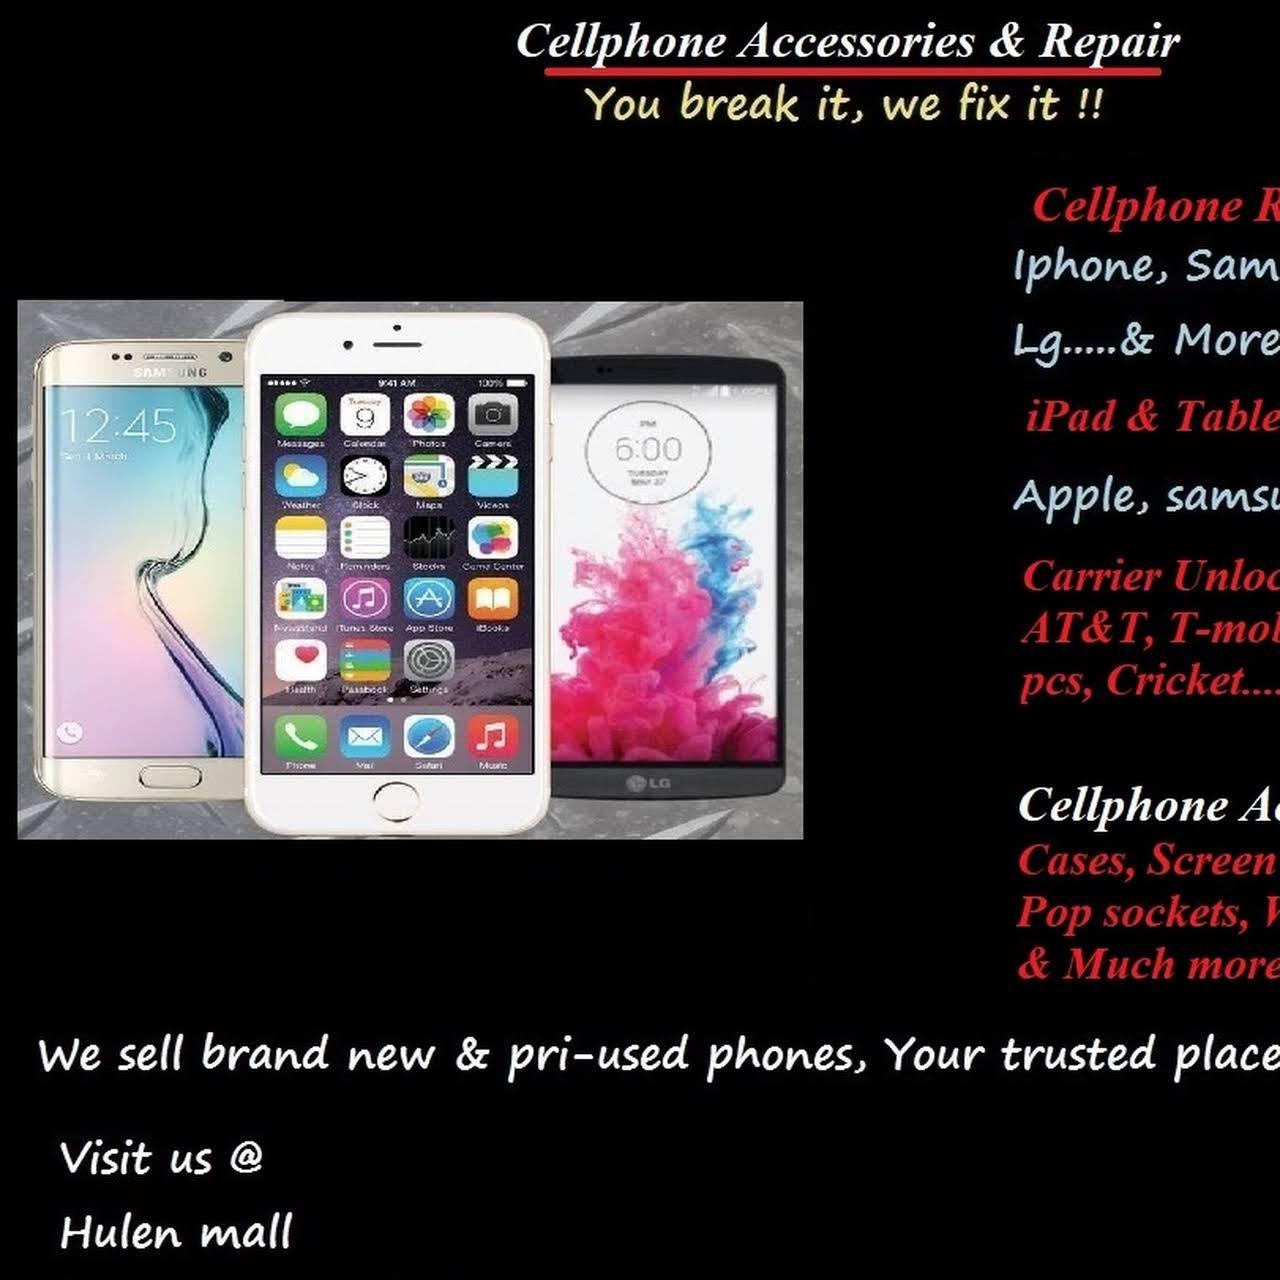 Cellphone Repair & Accessories - Cell Phone repair , iPhone